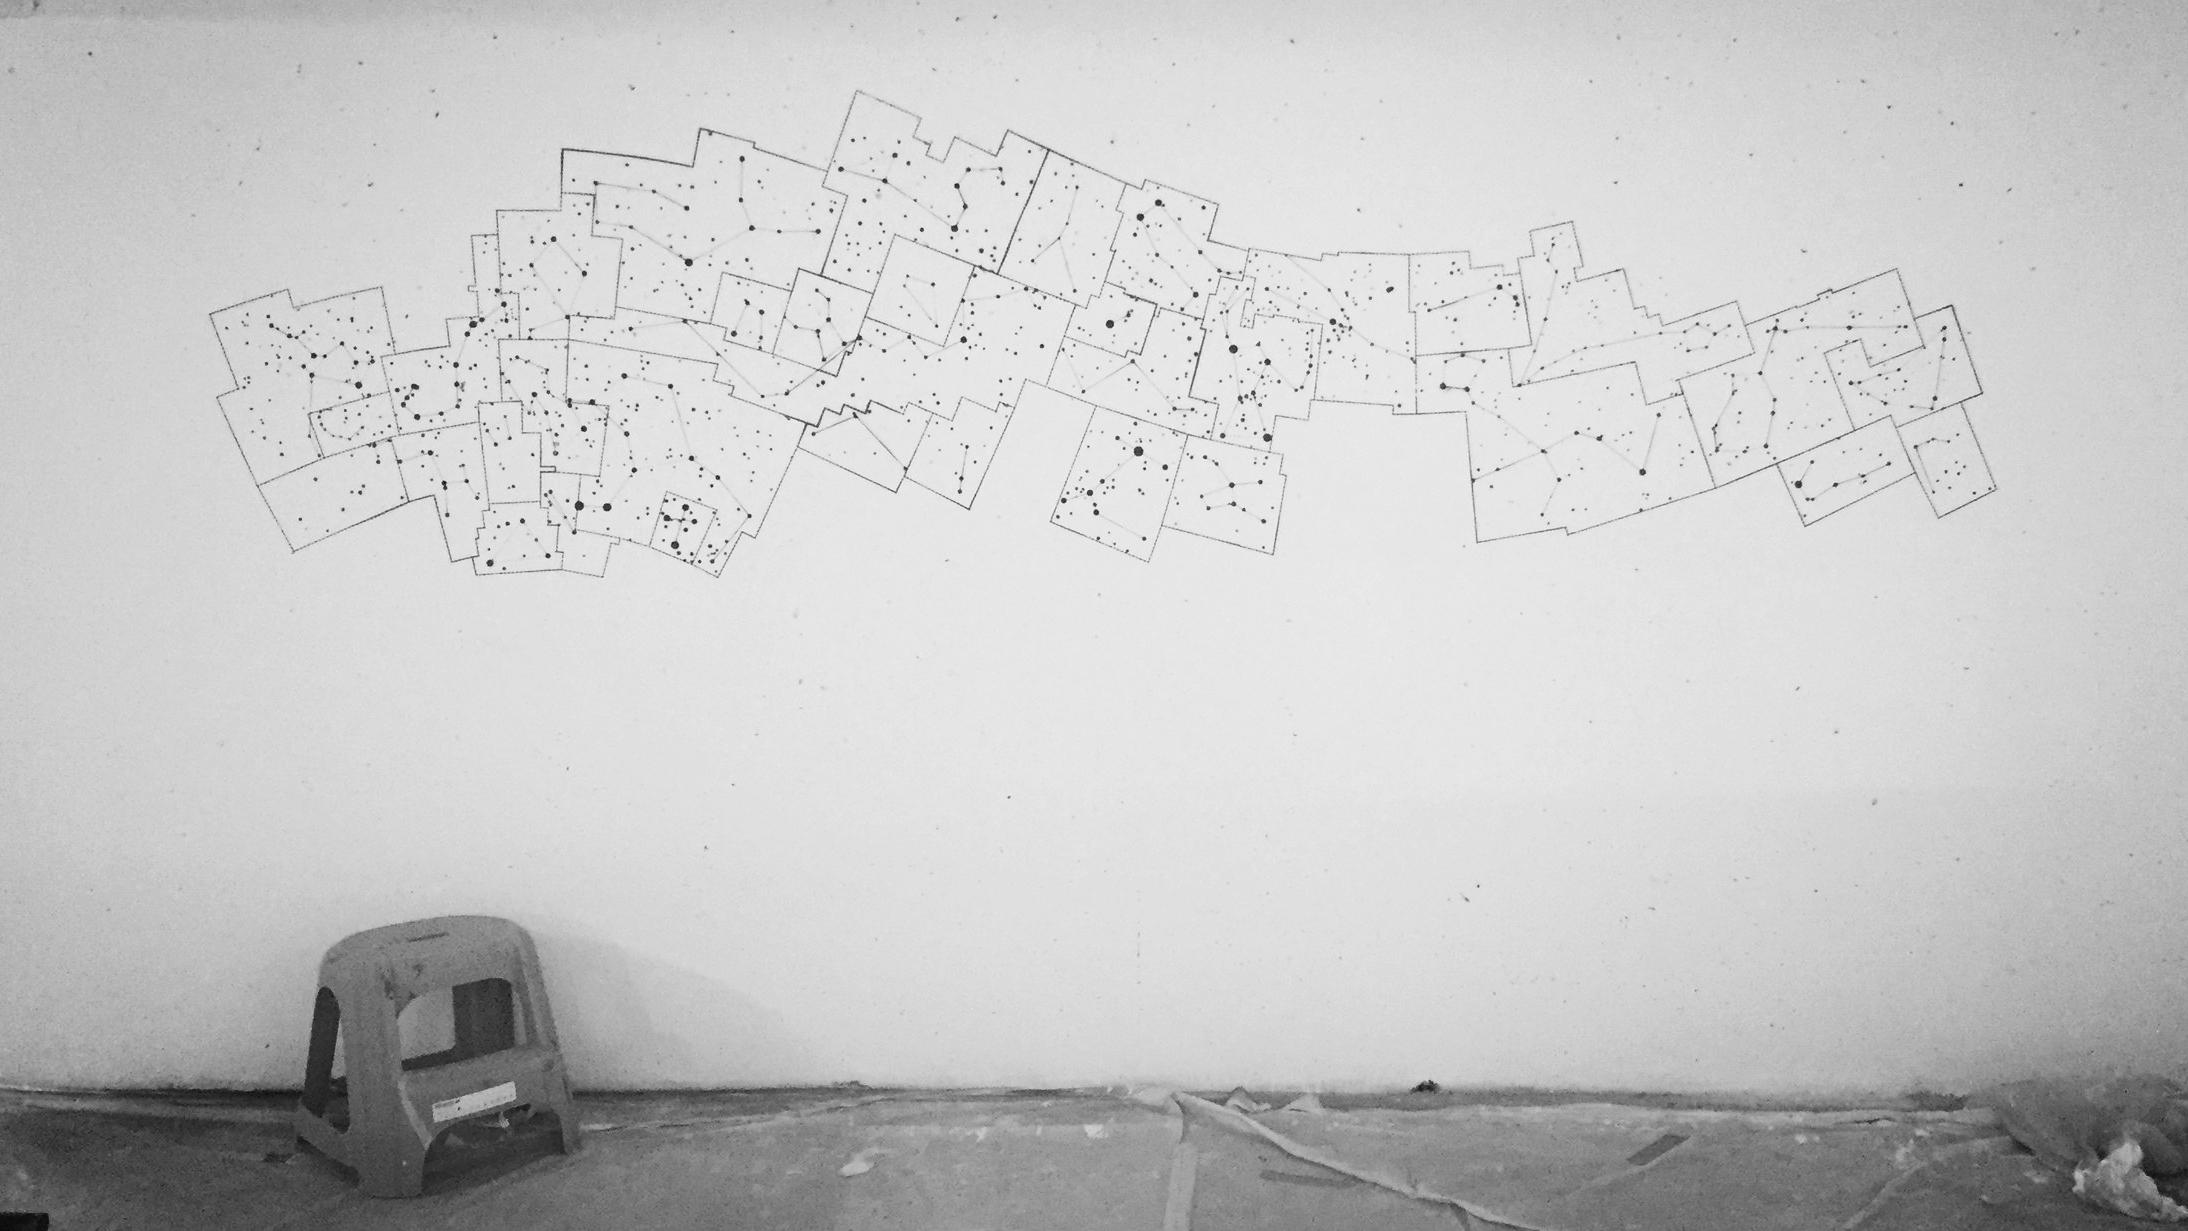 2KM3 contemporary art platform by Etienne de Fleurieu, stencil on wall